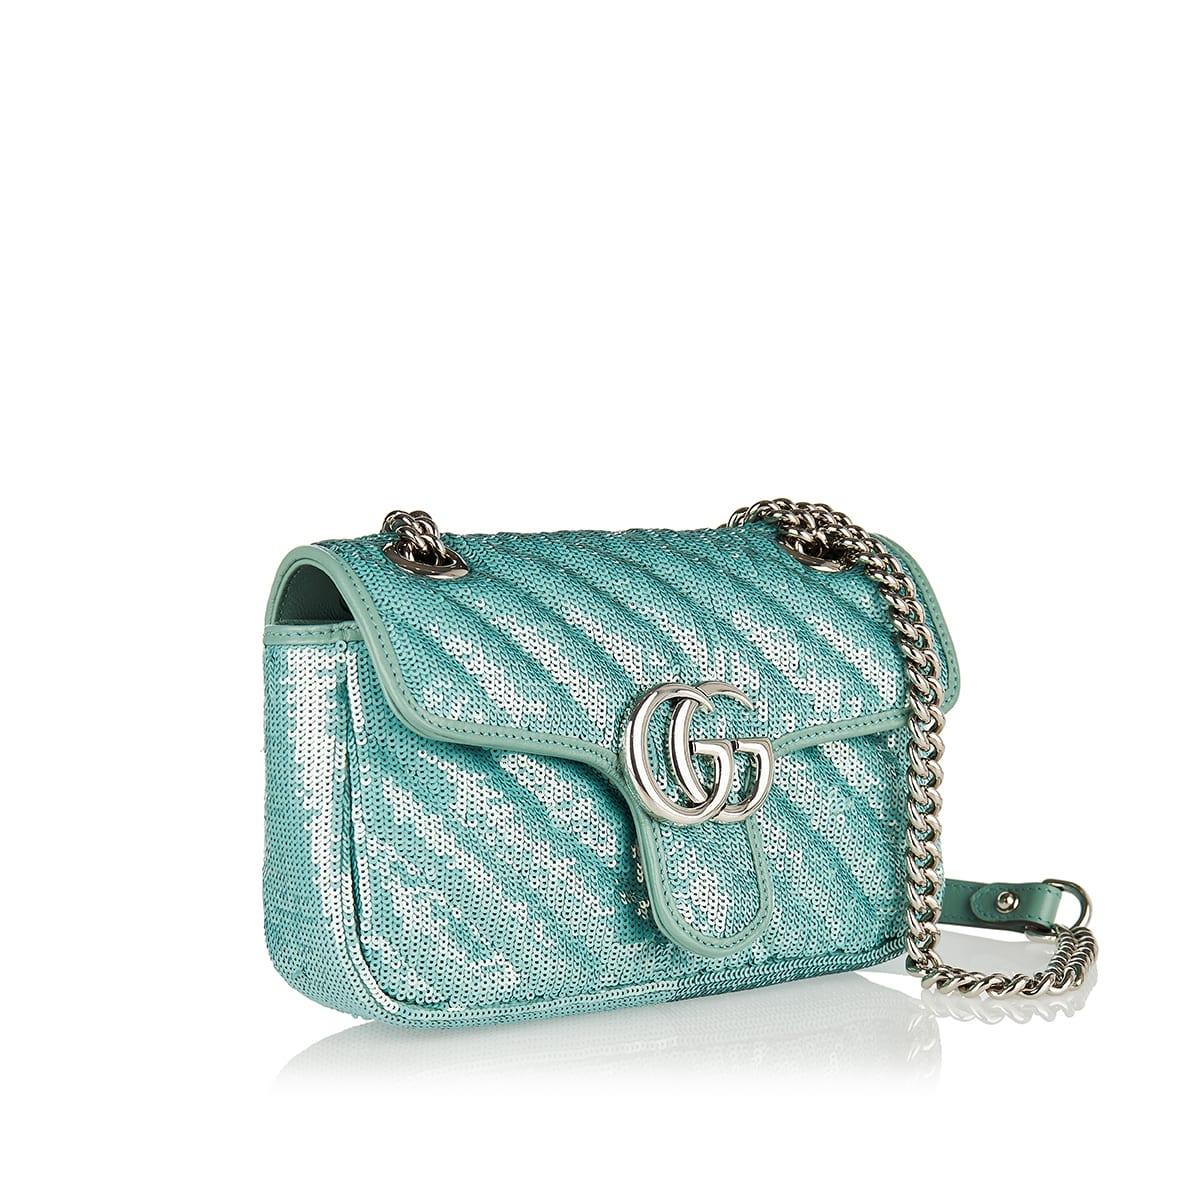 GG Marmont Mini sequin shoulder bag